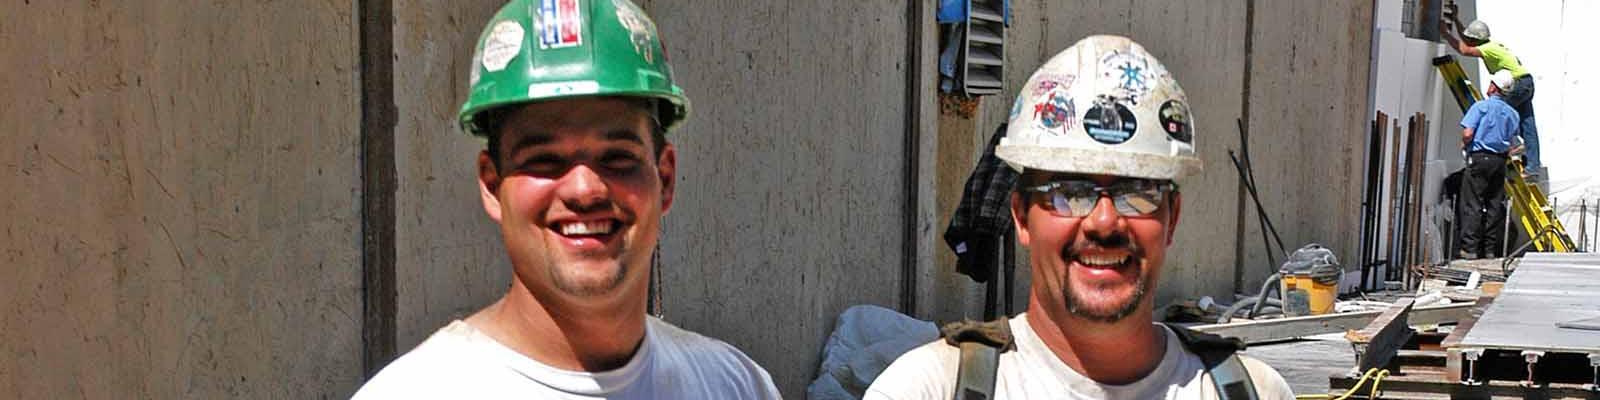 Journeyman ironworkers construction workers